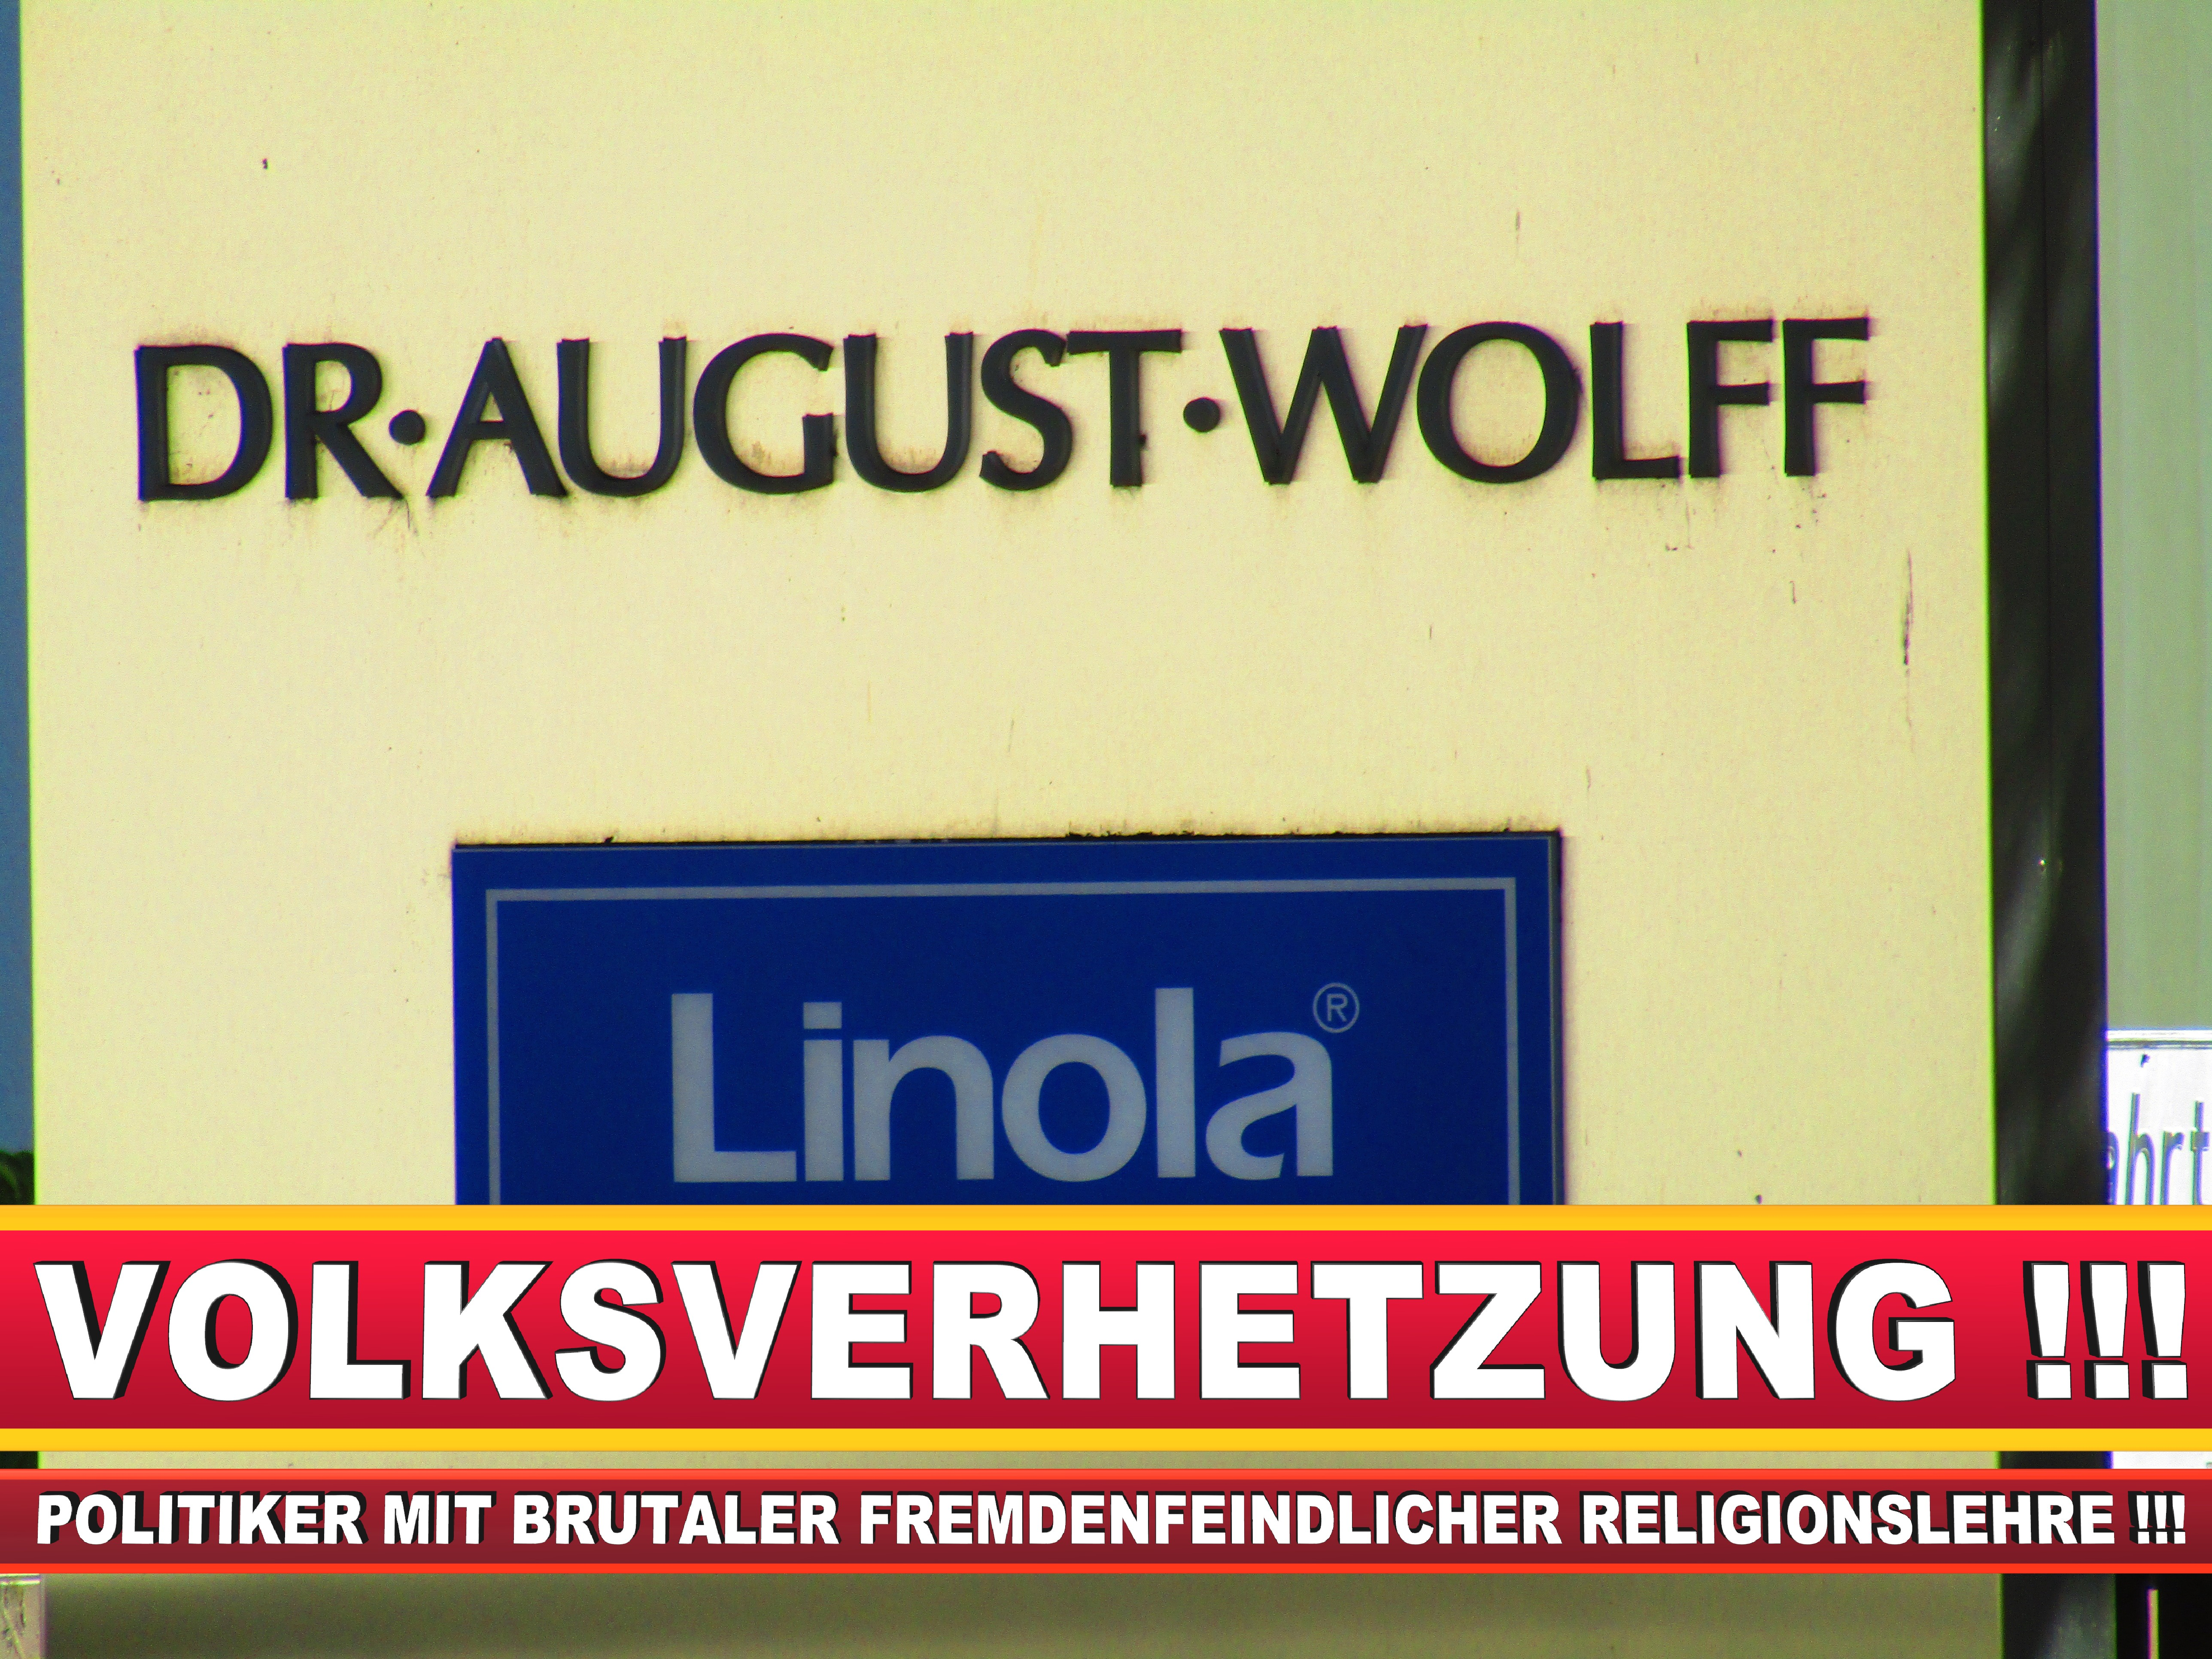 Dr August Wolff Linola CDU Bielefeld NRW OWL (4)